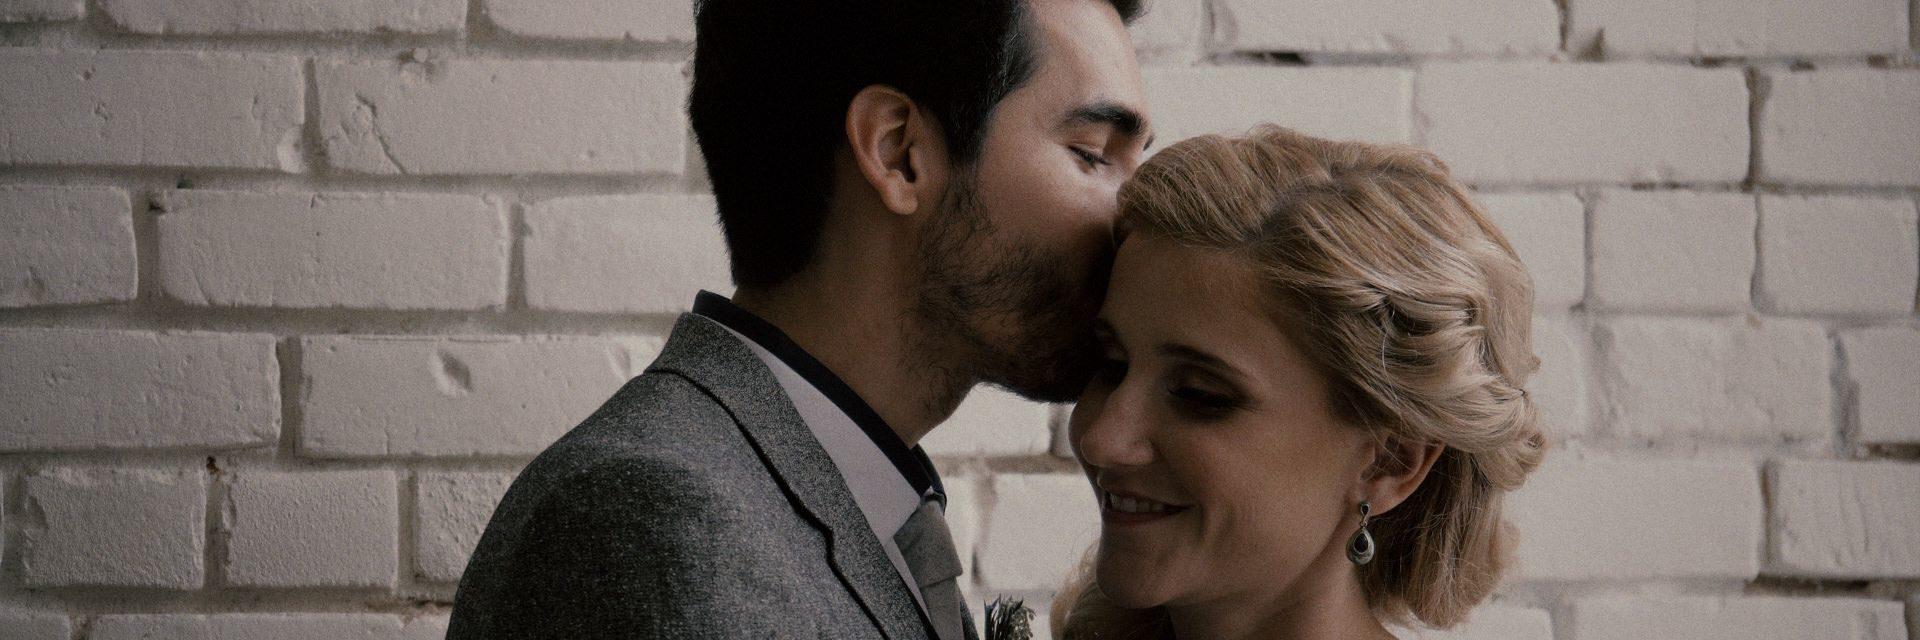 Lindos-wedding-videographer-cinemate-films-03